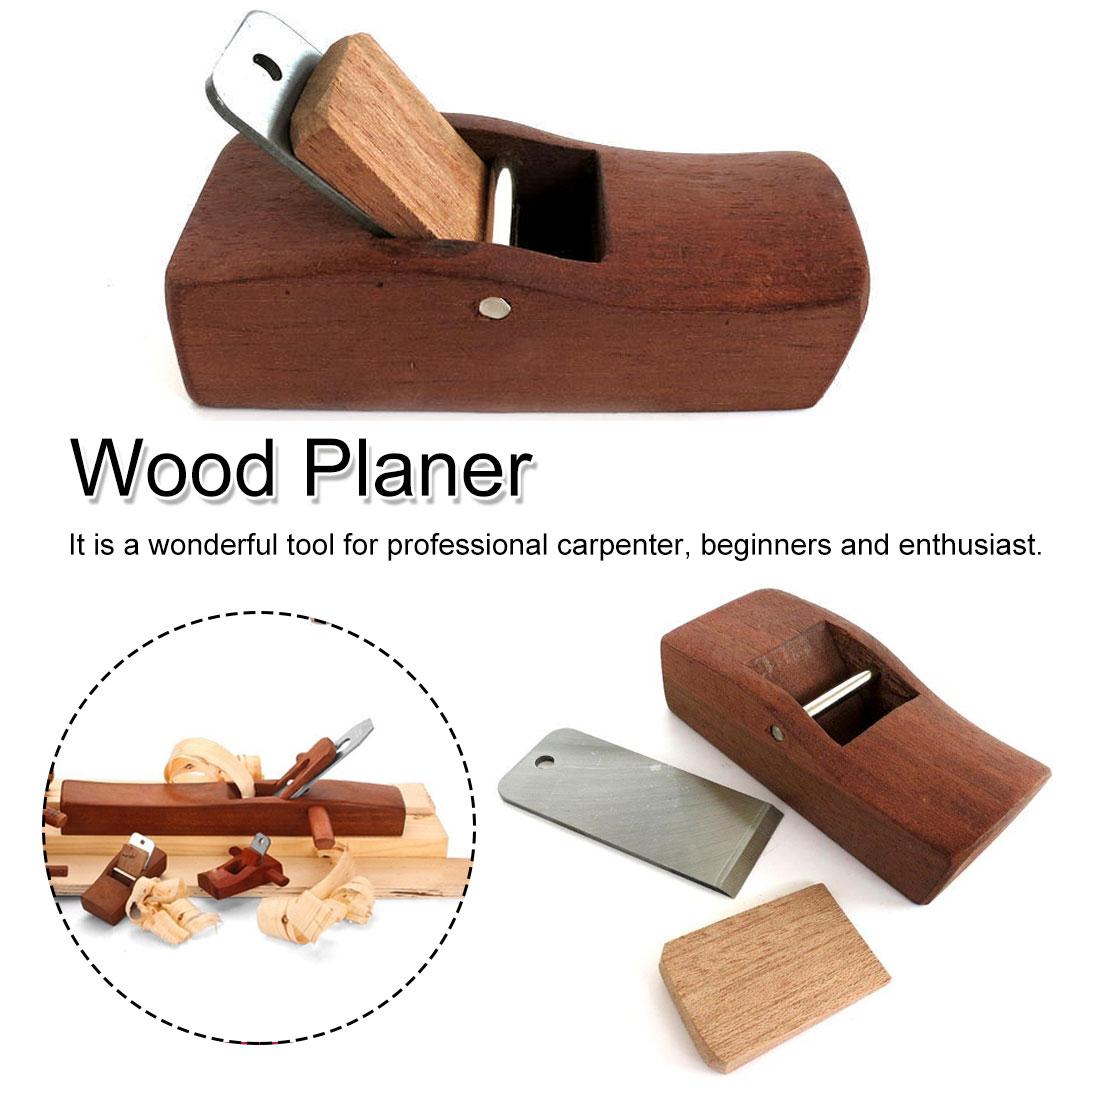 Hand Plane Wood Planer Flat Plane Bottom Edge Planer Blades Woodworking Plane For Carpenter Woodcraft Tool